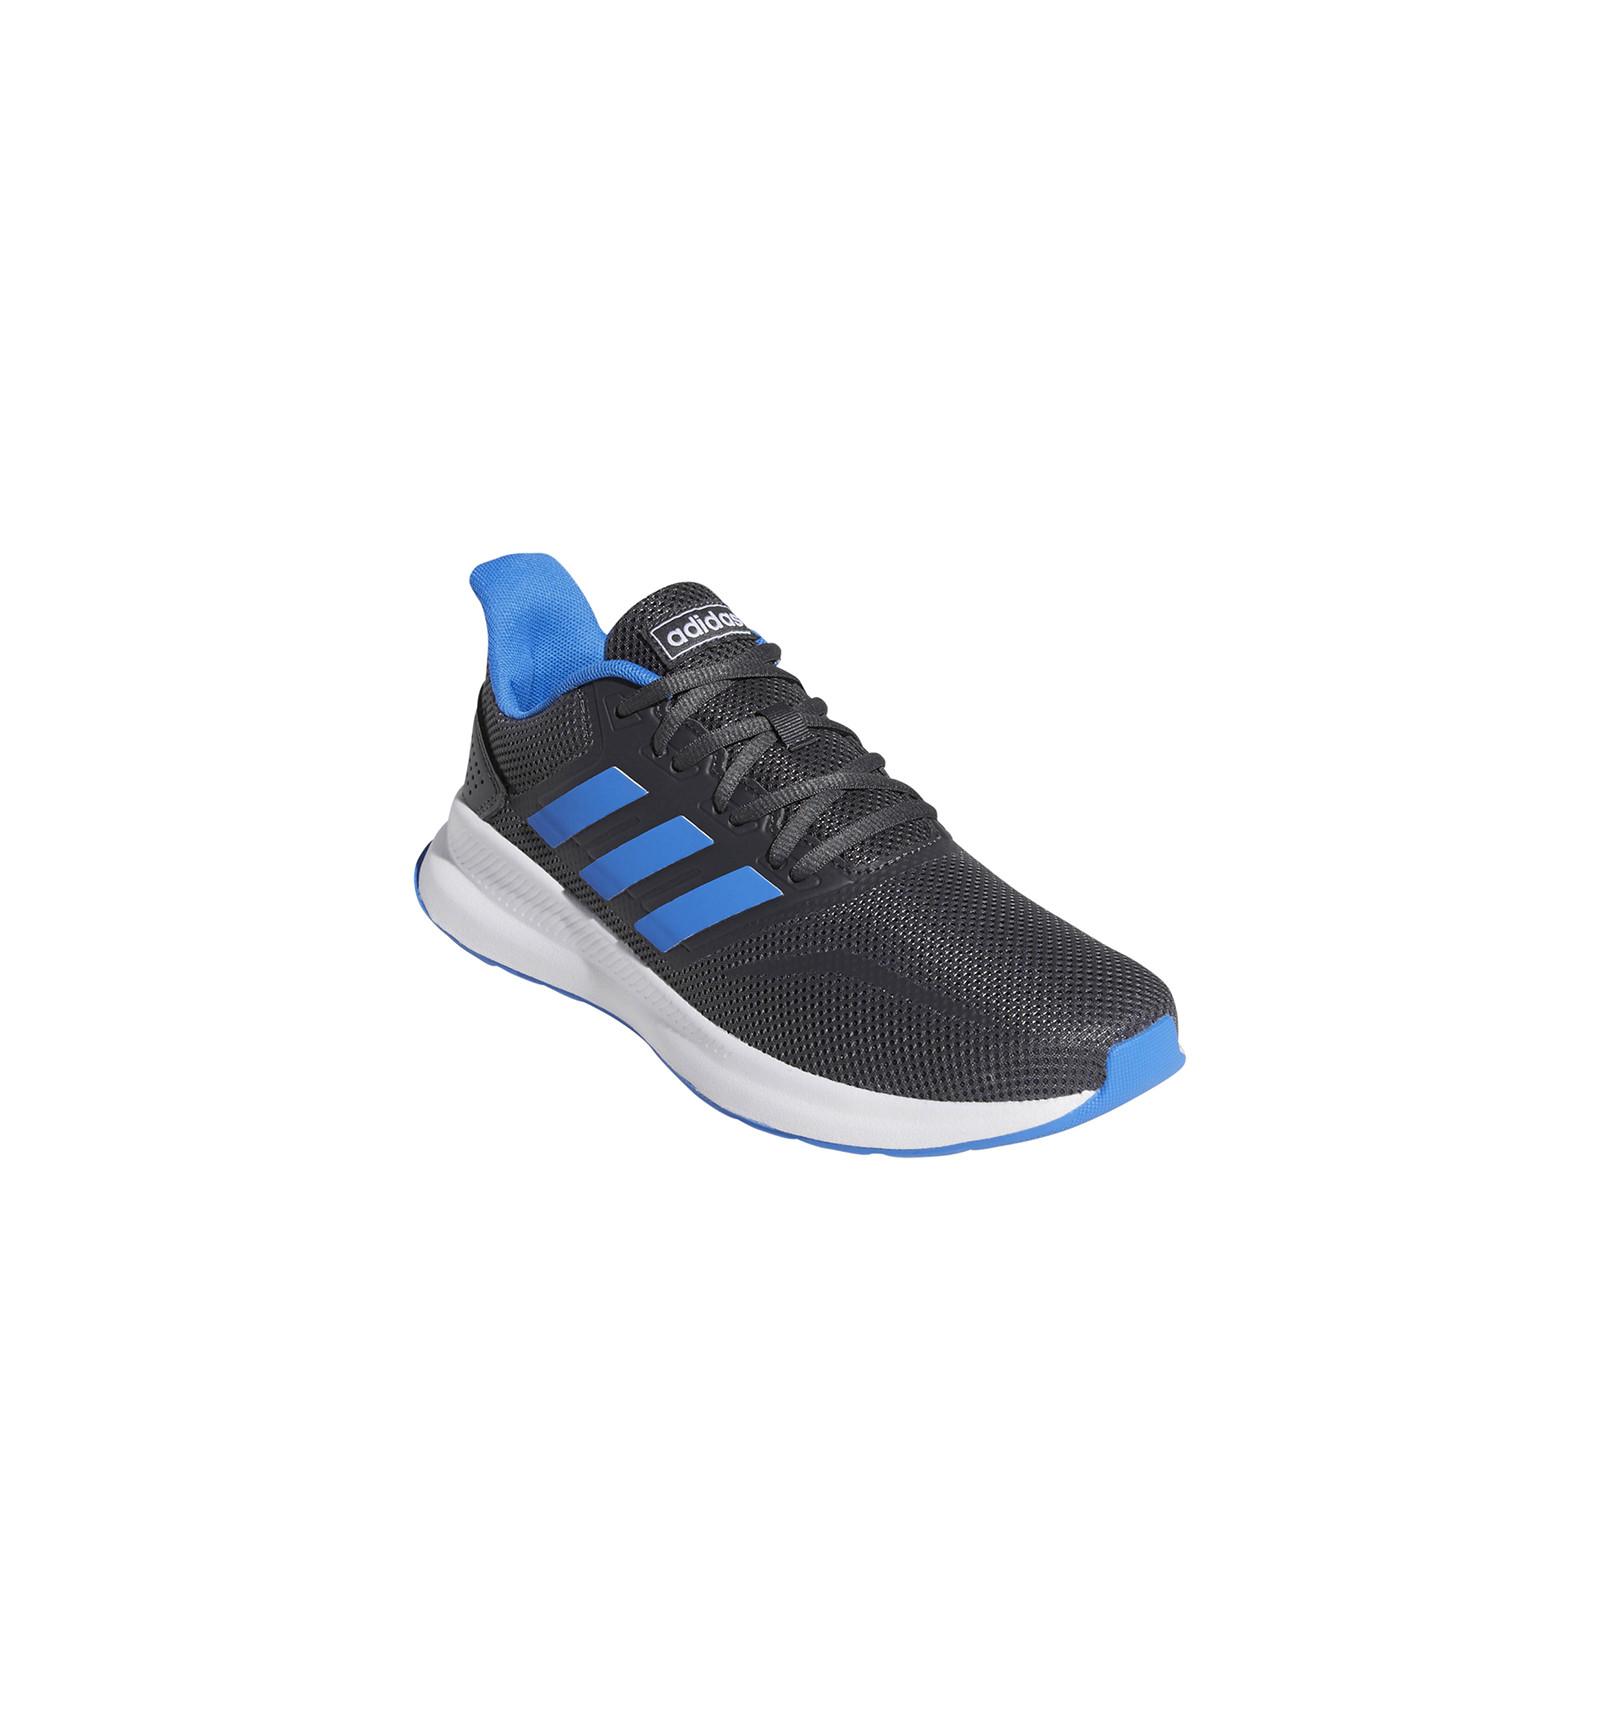 96cddee1 Adidas - Zapatillas adidas running Run Falcon gris